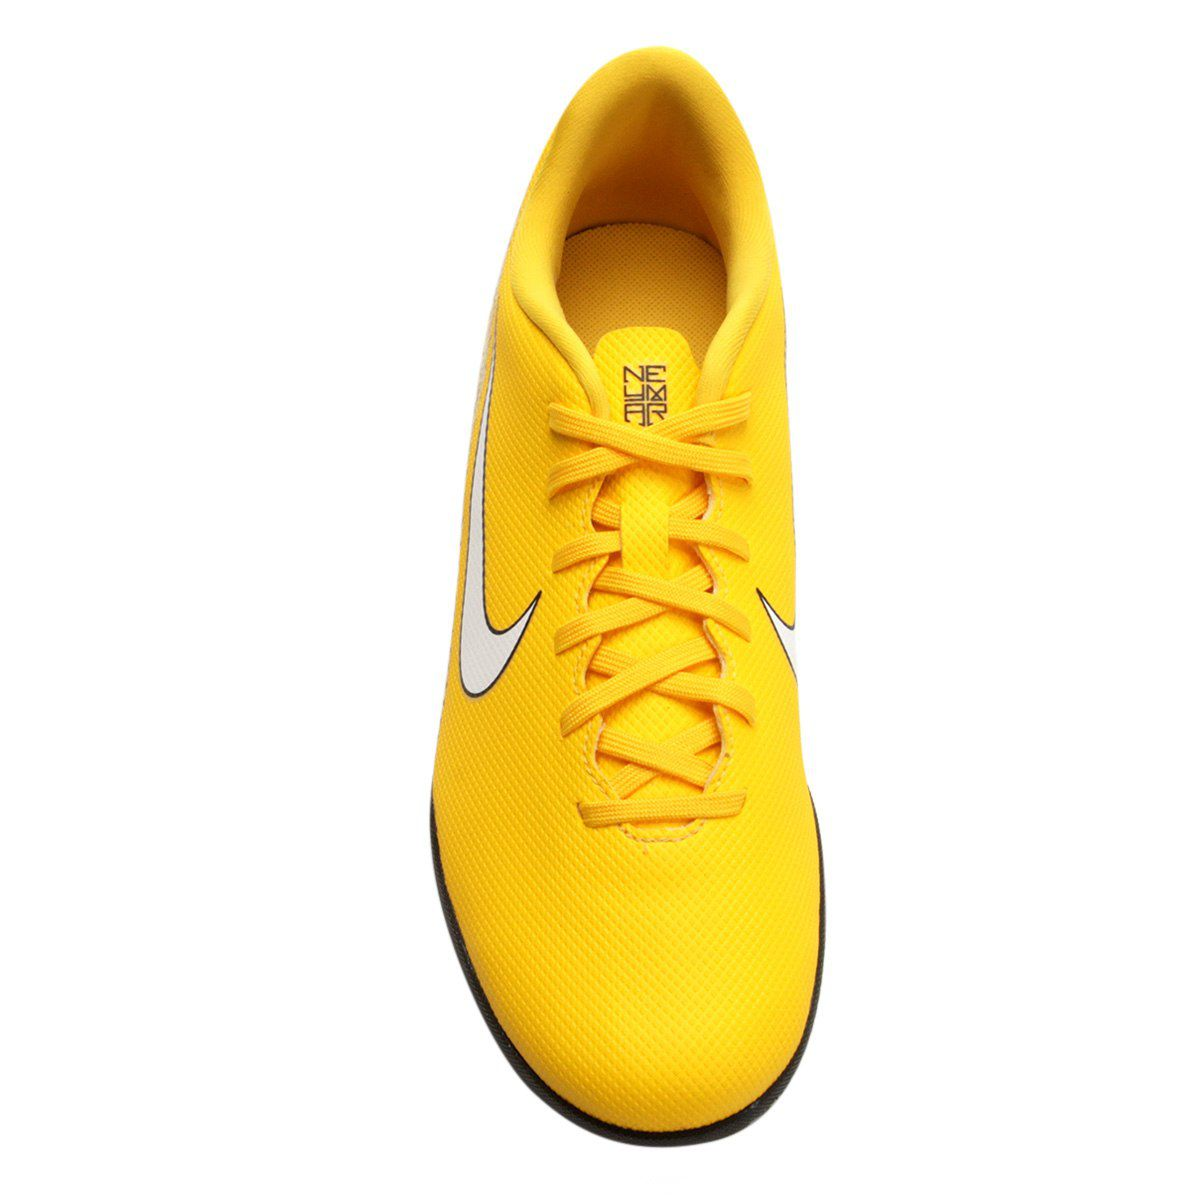 71f5c7f55 ... Chuteira Futsal Nike Mercurial Vapor X Neymar 12 Club JR - Amarela ...